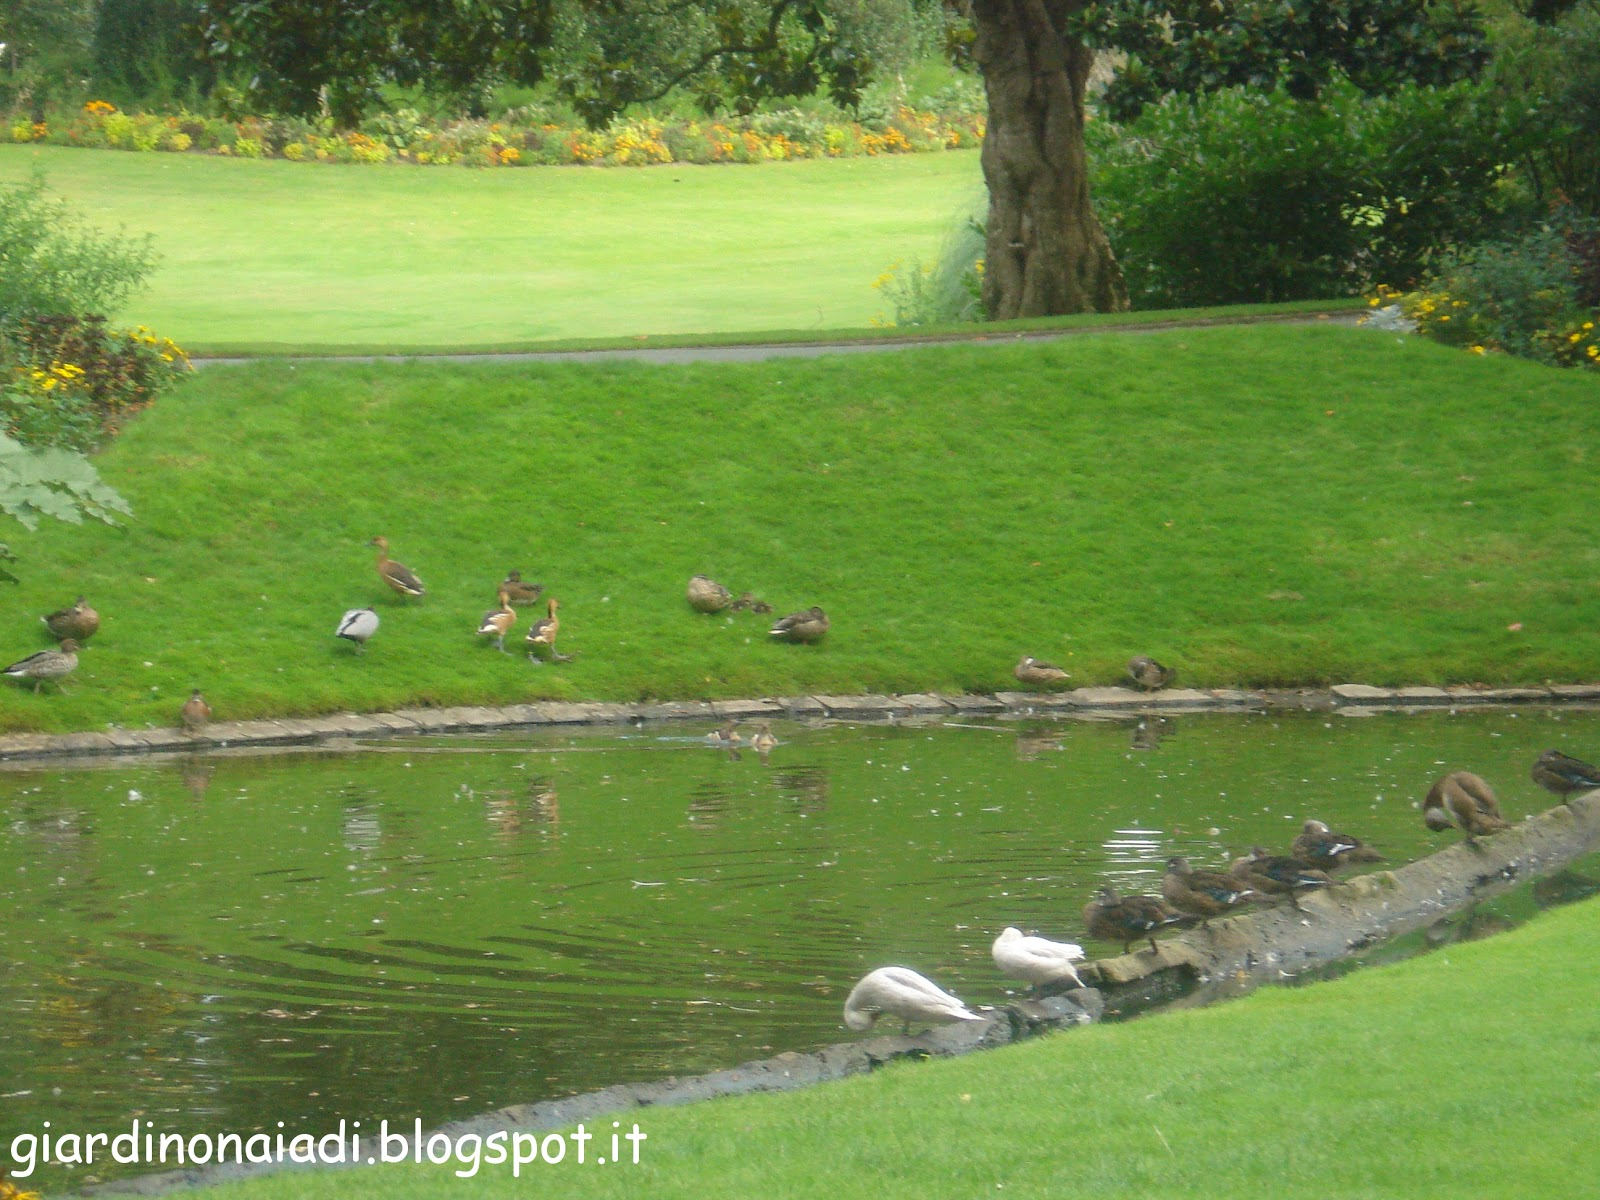 Laghetti da giardino per tartarughe stunning laguna for Laghetto per tartarughe usato